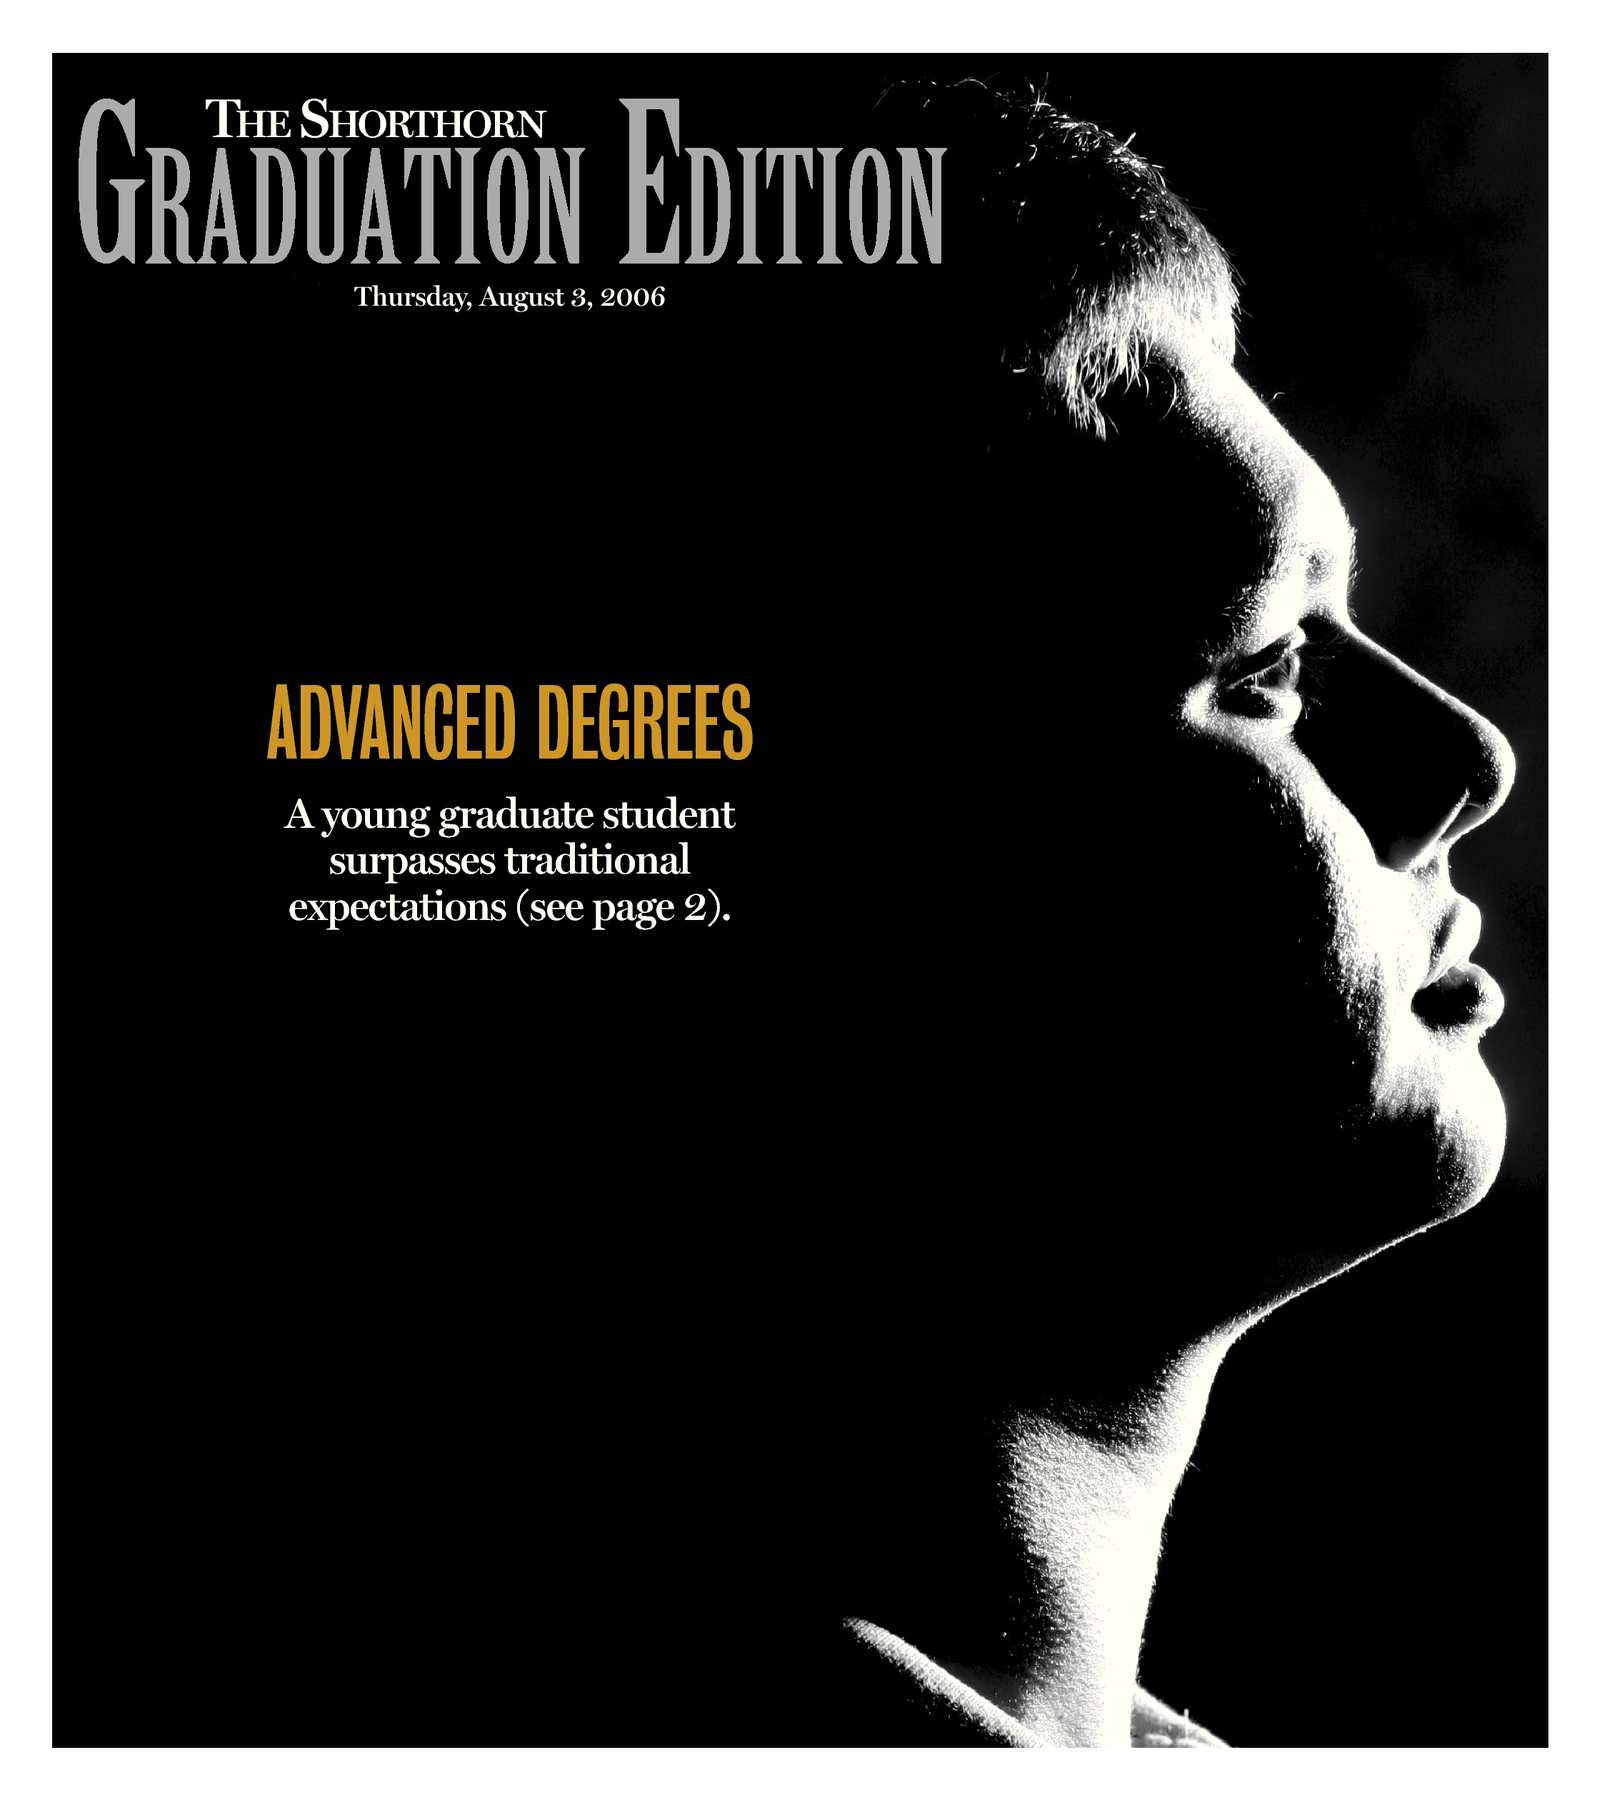 About Graduate School of Xidian University